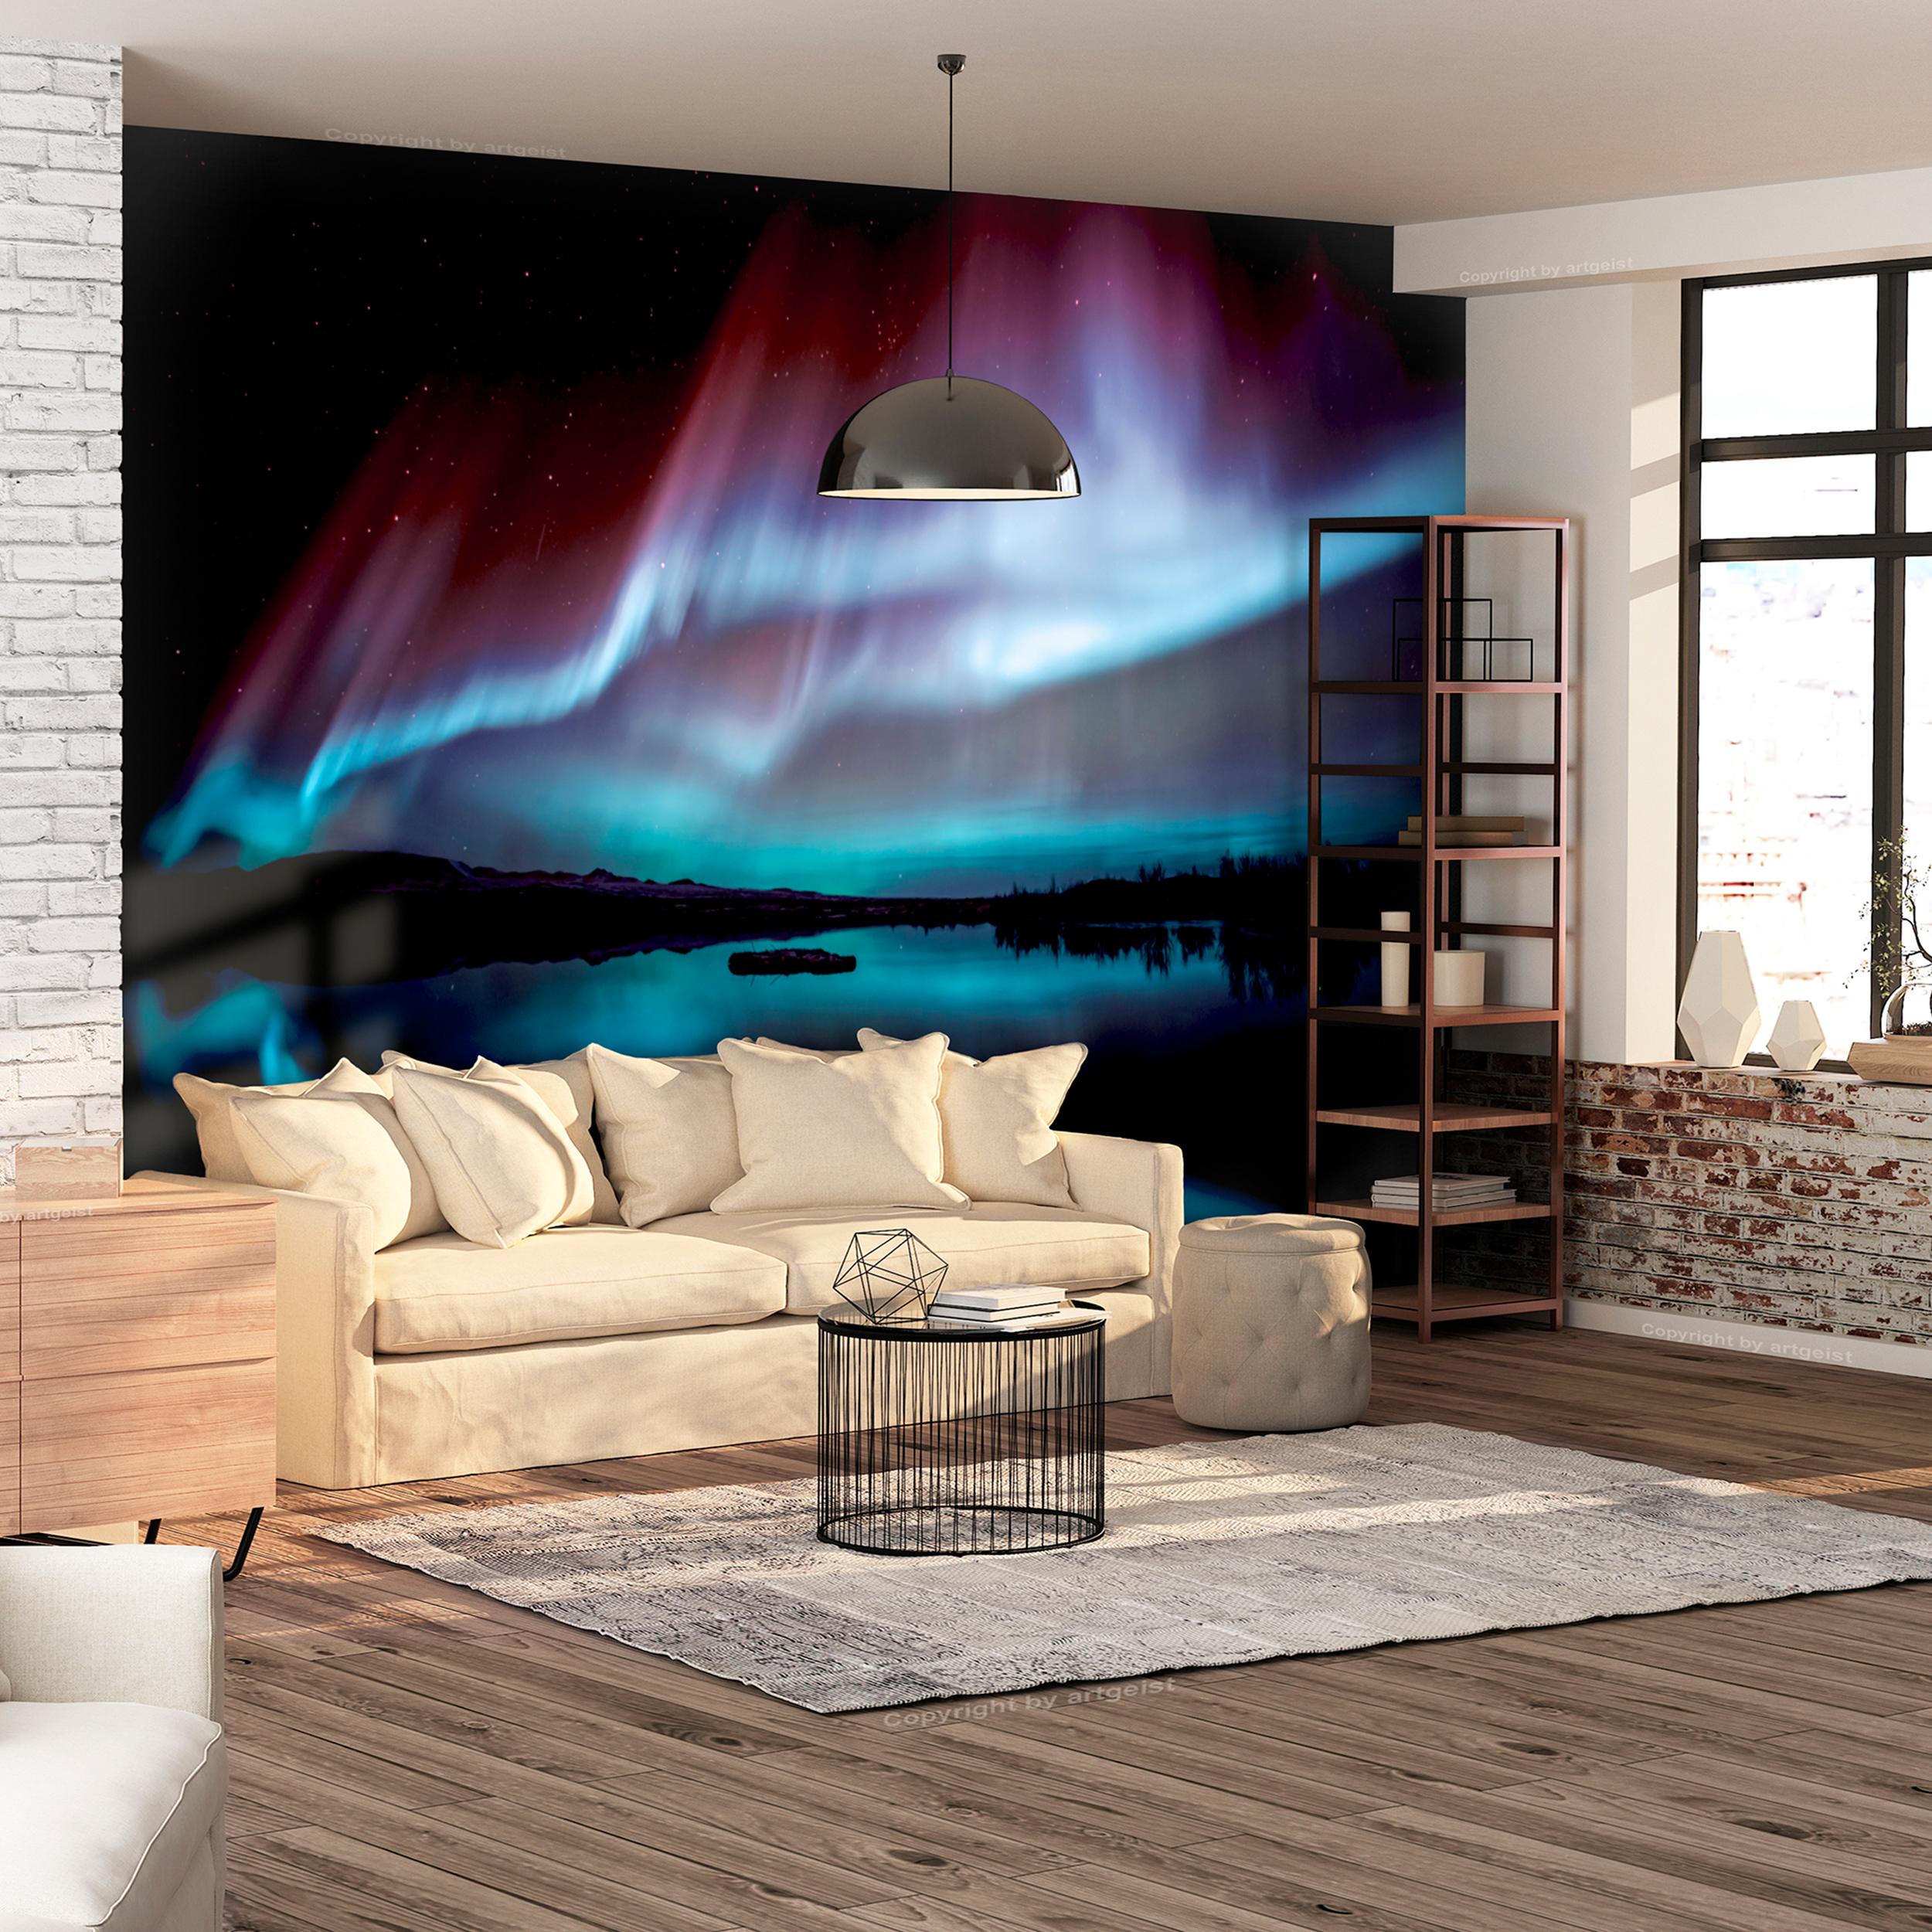 vlies fototapete polarlicht nordlichter himmel tapete. Black Bedroom Furniture Sets. Home Design Ideas